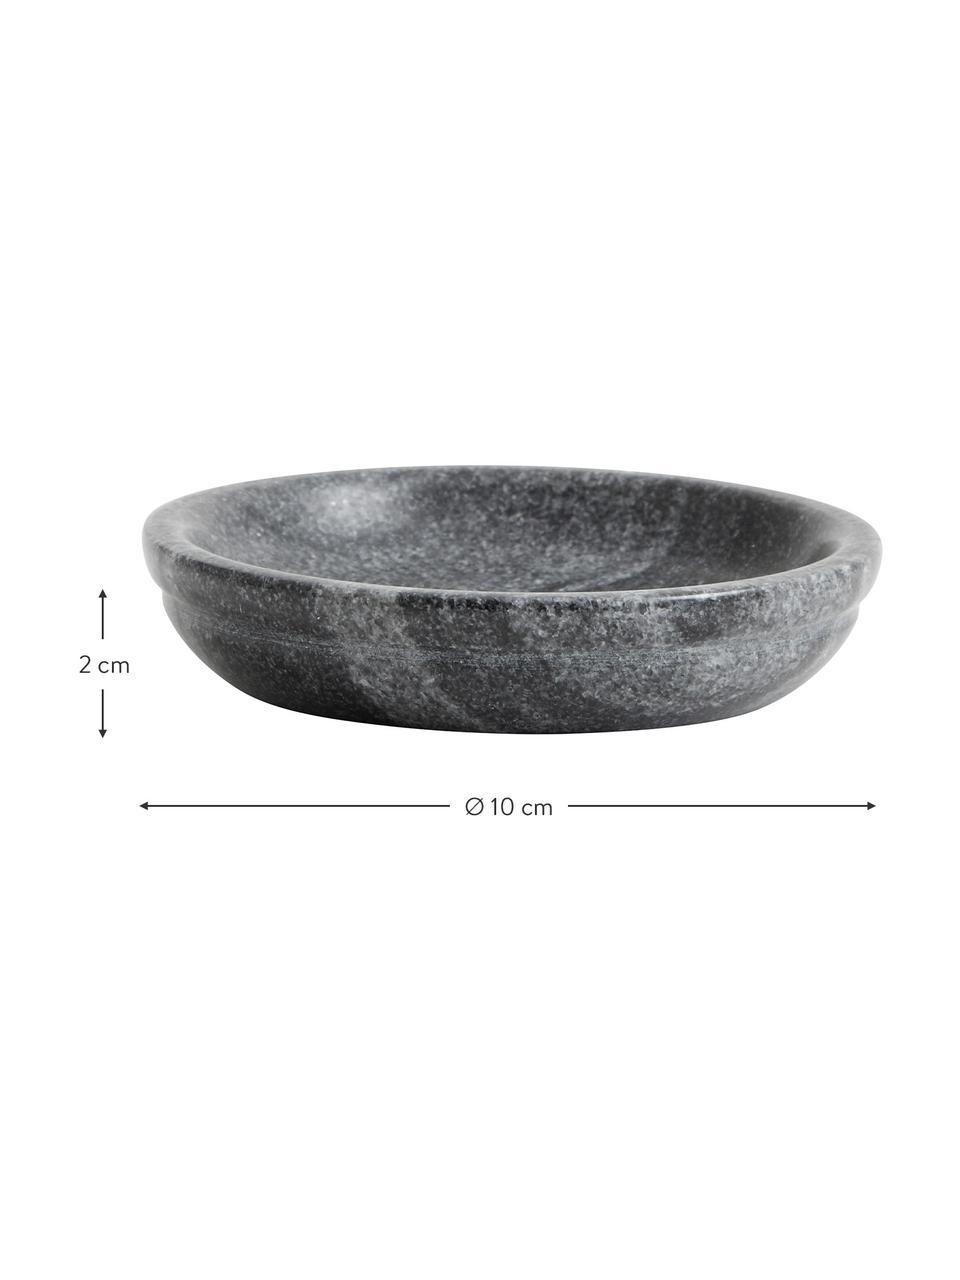 Deko-Schale Aggaz, Marmor, Grau, marmoriert, Ø 10 x H 2 cm